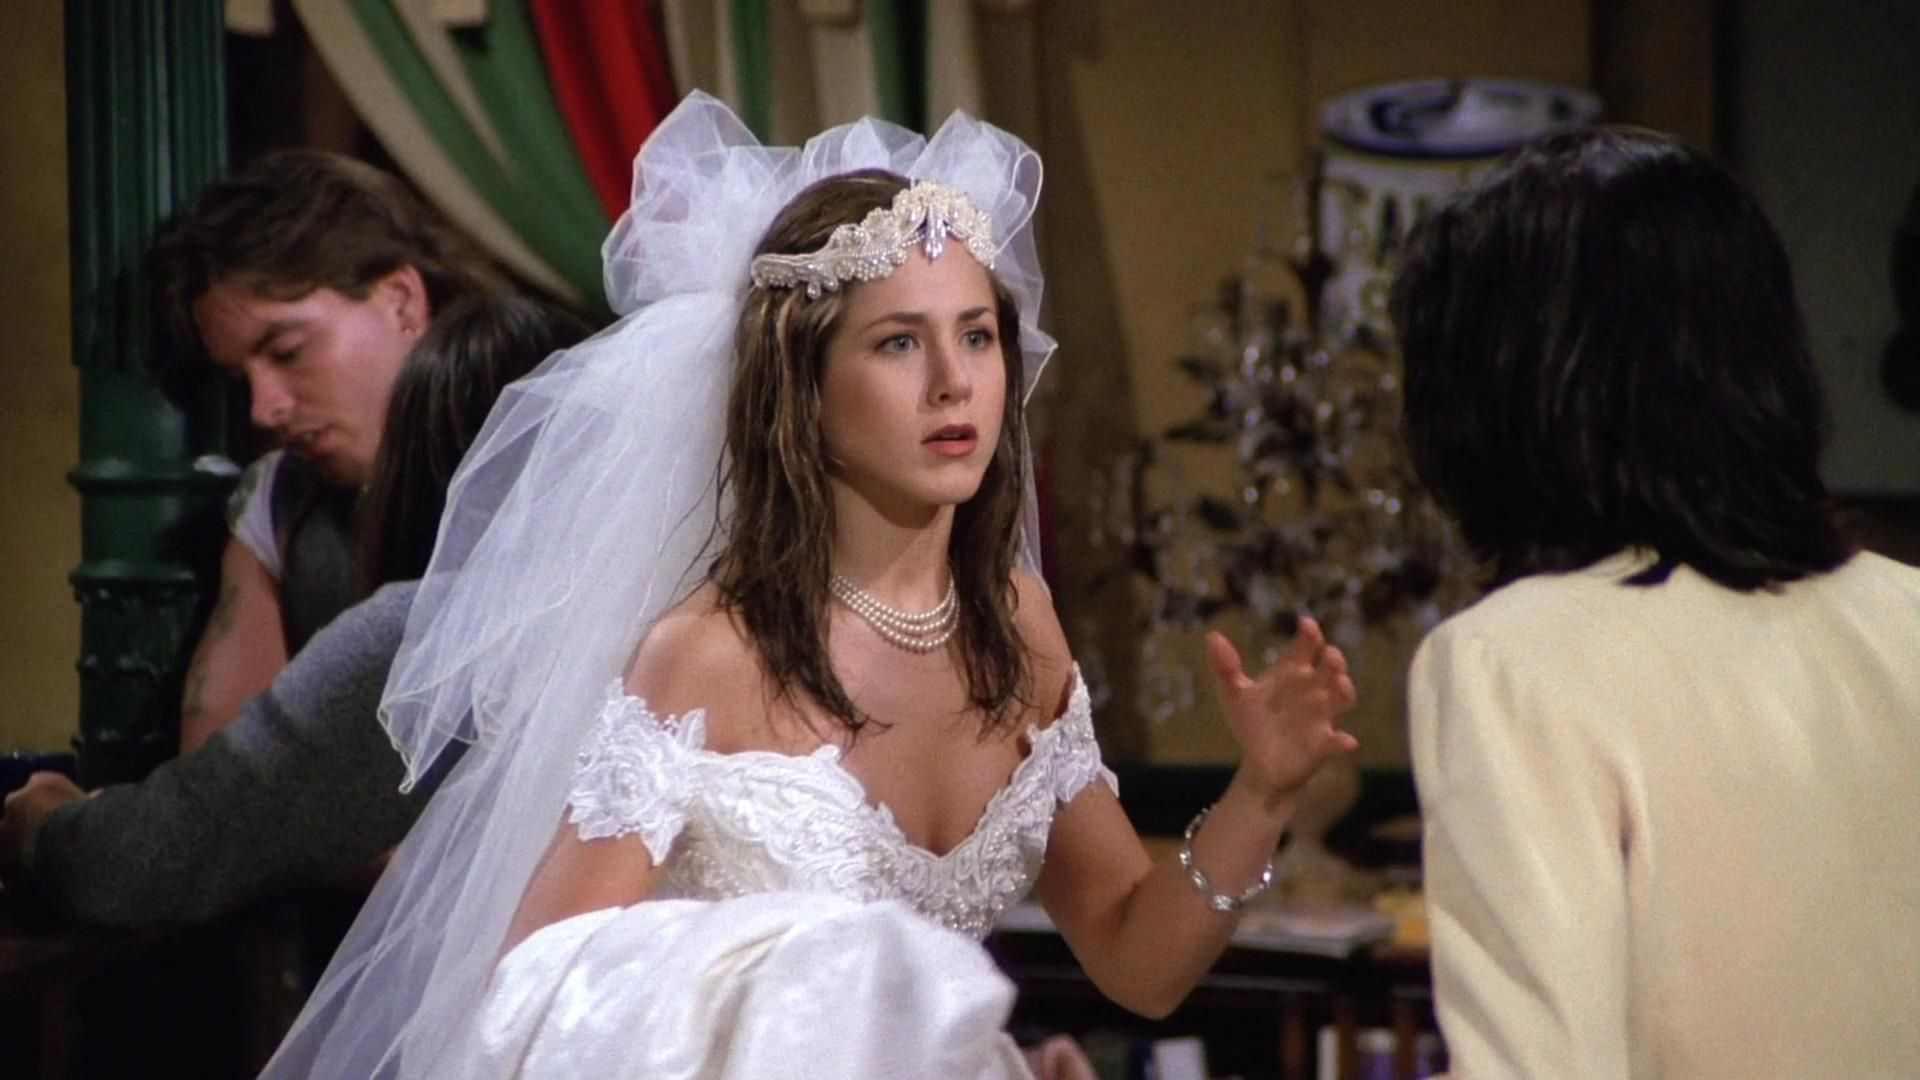 Jennifer Aniston As Rachel Green On Friends From The Pilot Episode Robe De Mariee Jenifer Aniston Les Saisons [ 1080 x 1920 Pixel ]